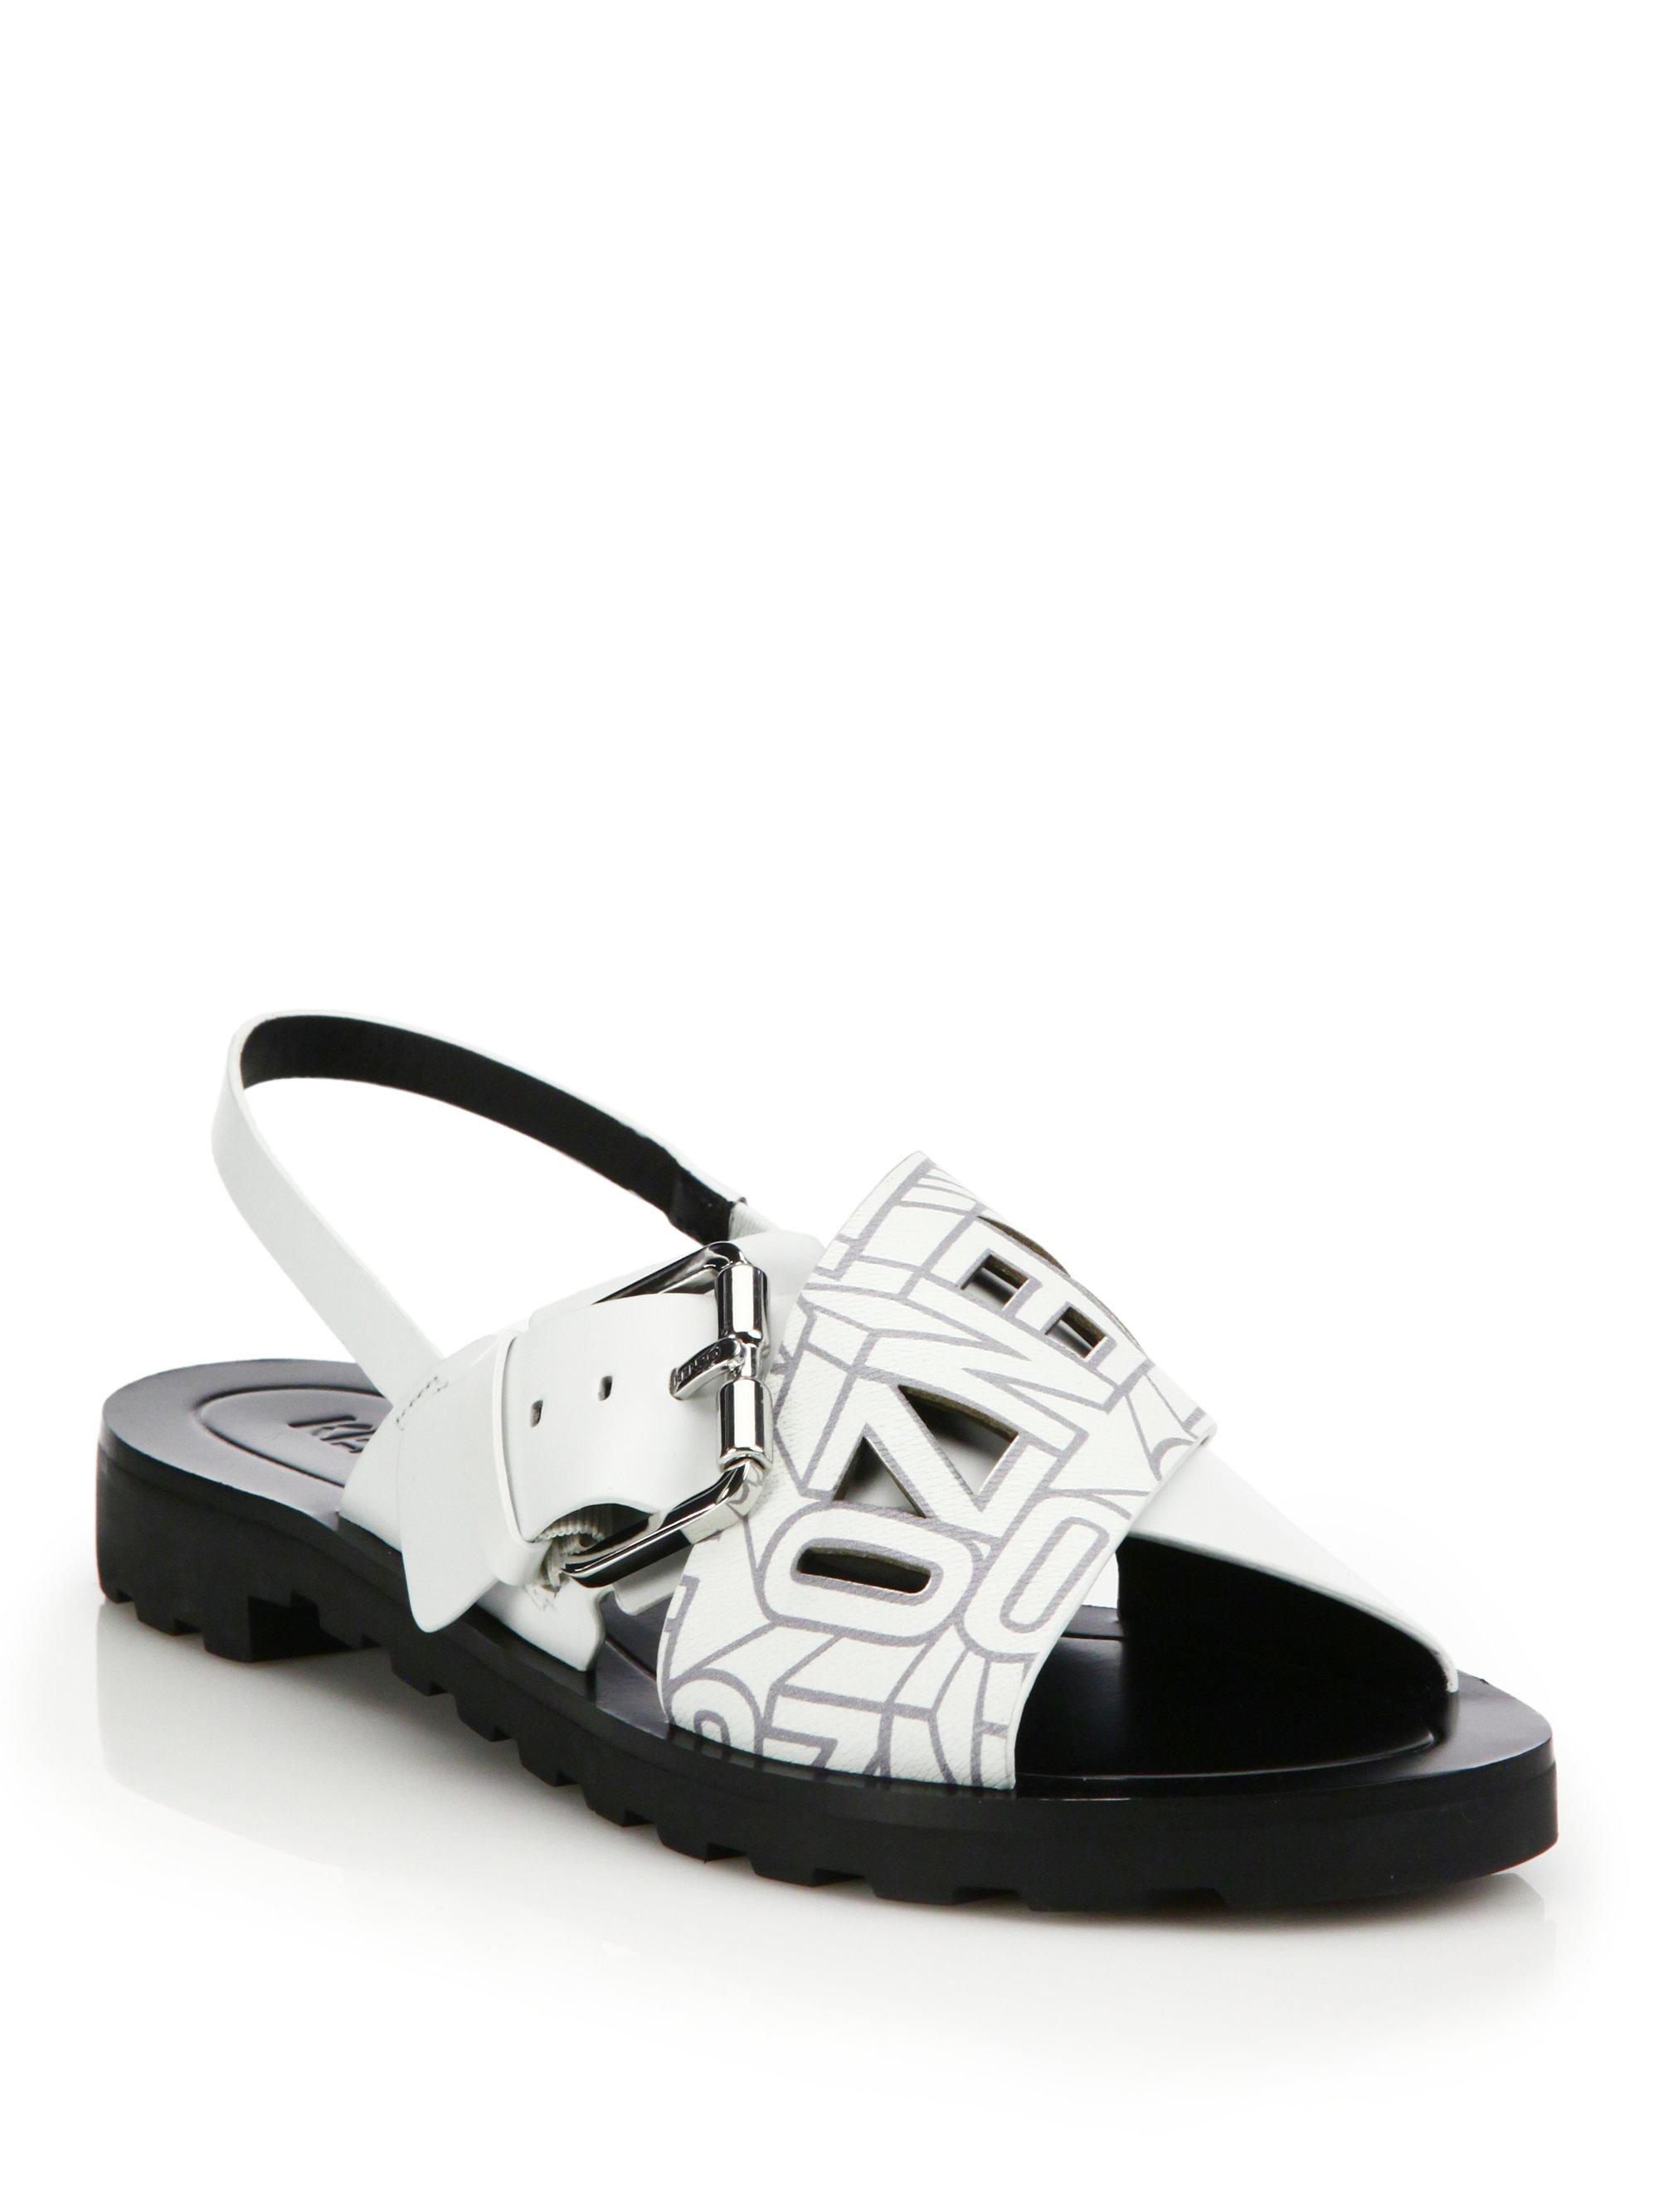 Kenzo Black Leather Slides yWoMsEYx